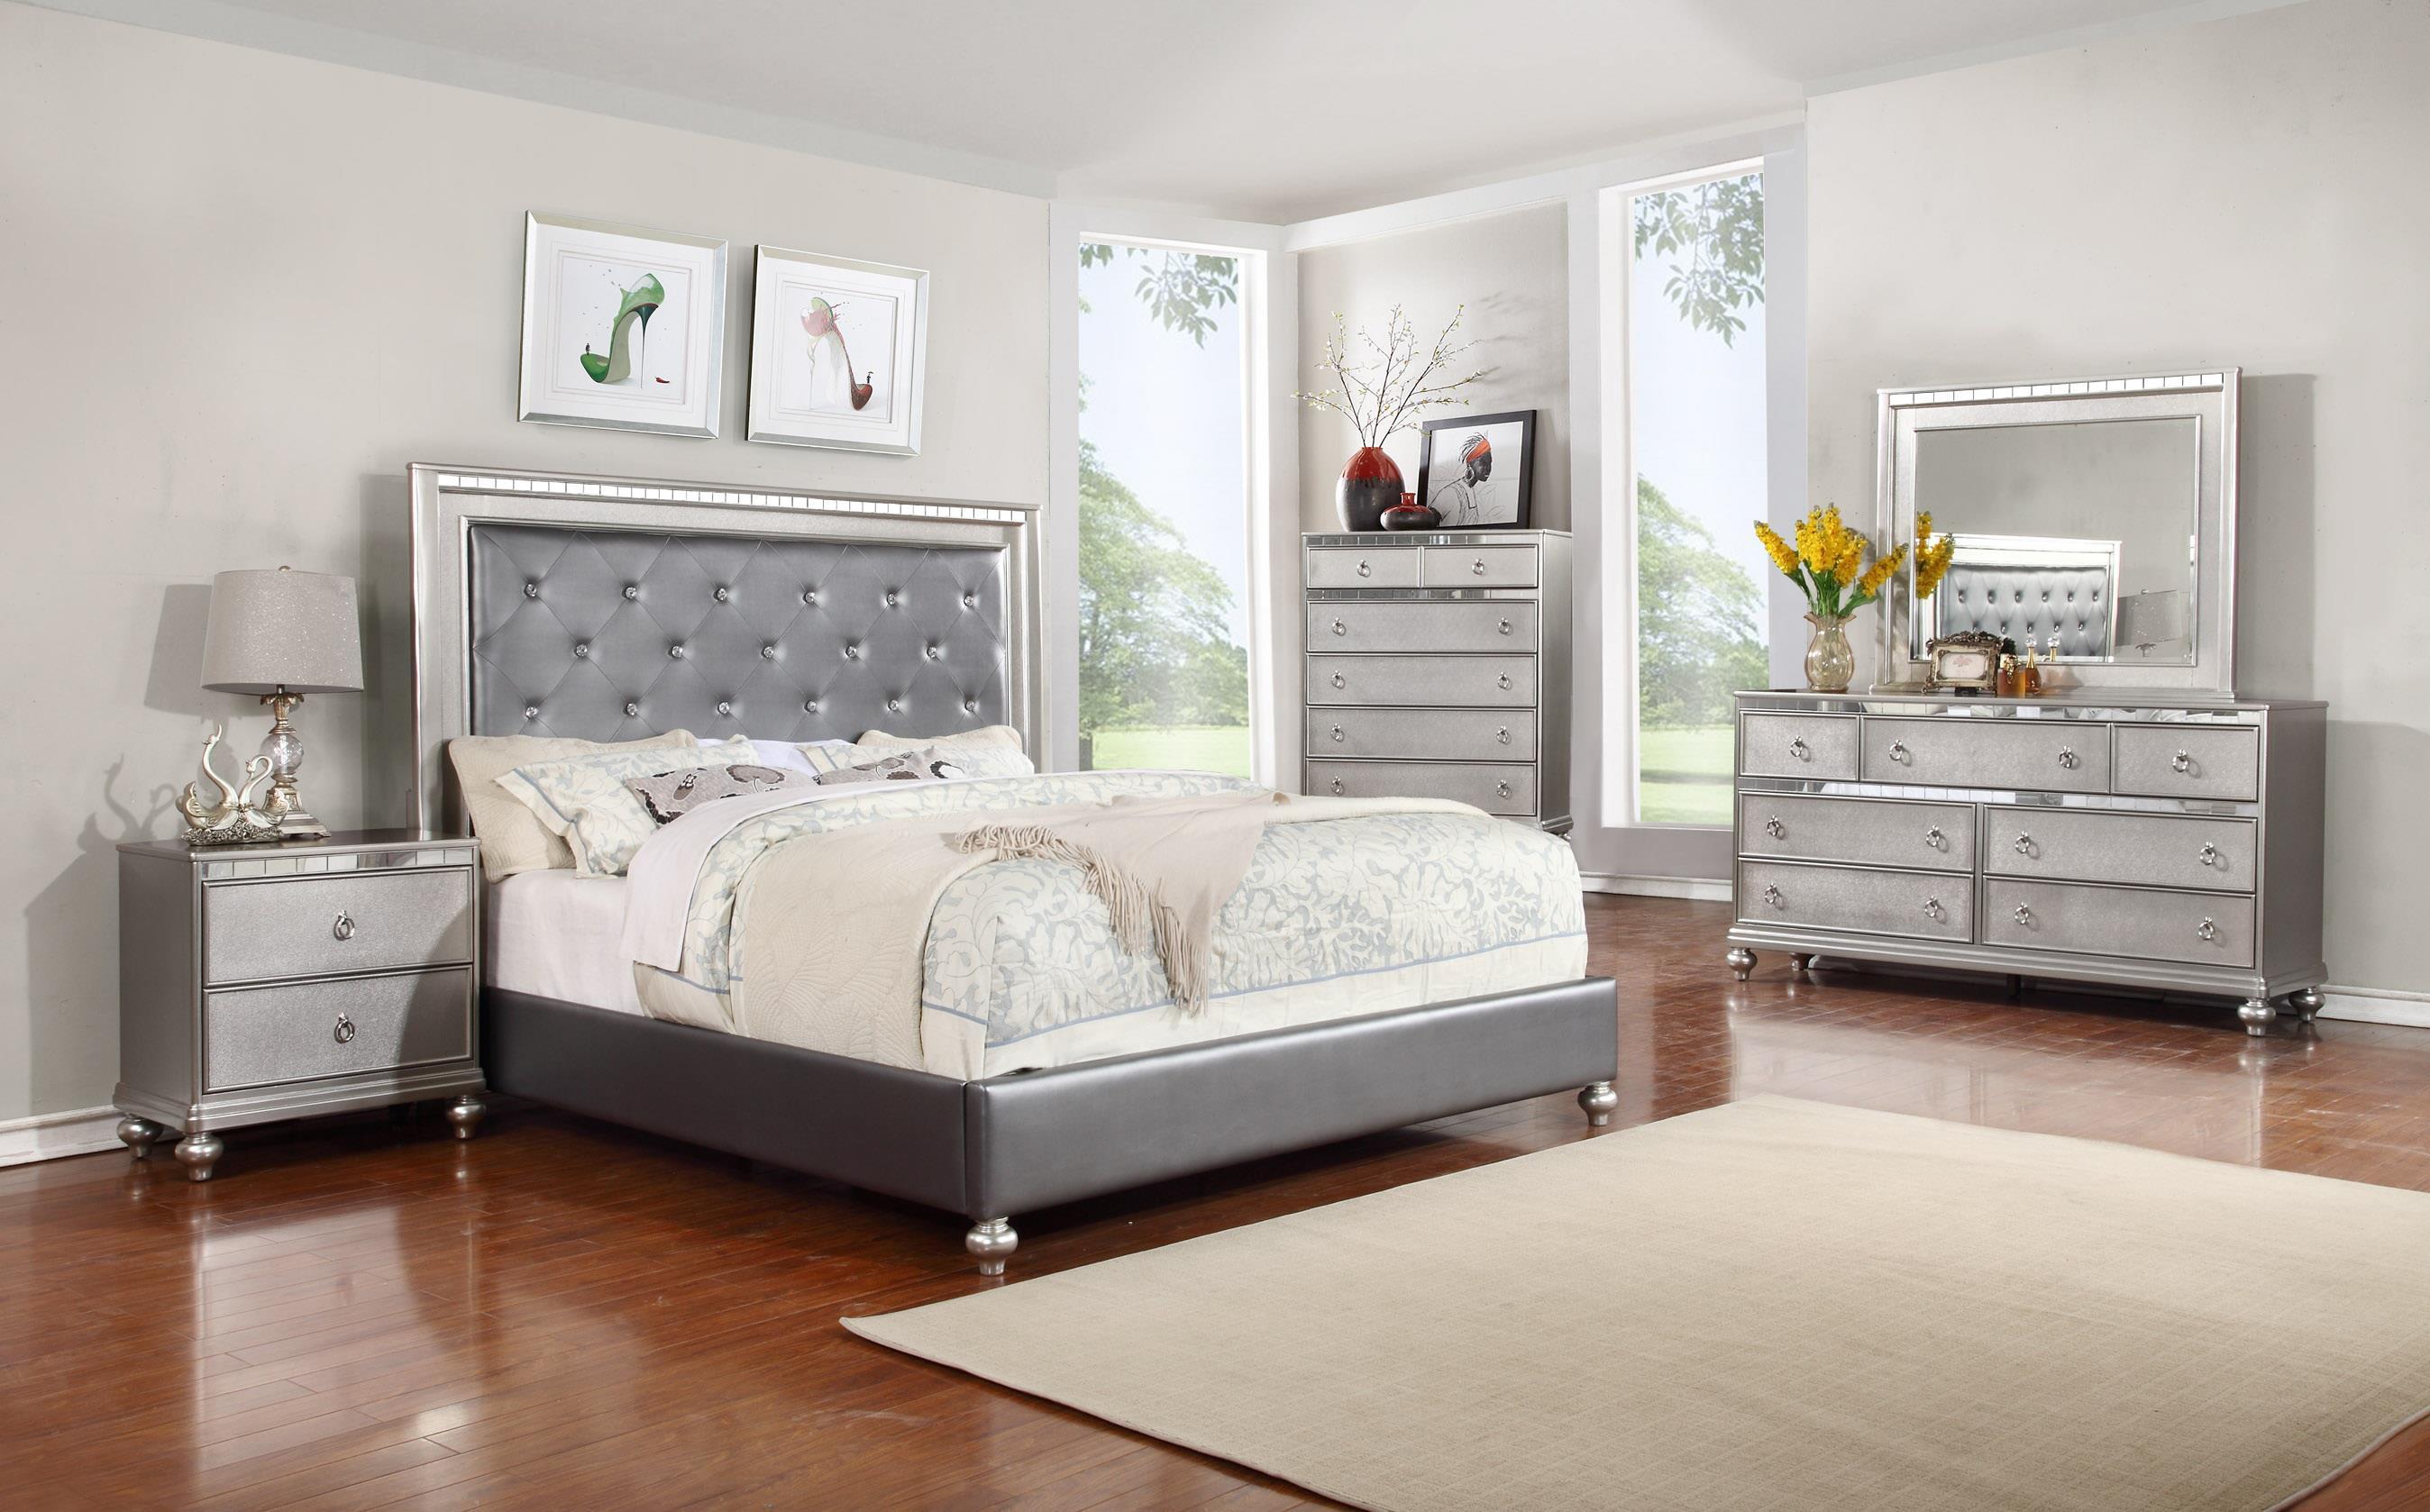 bedroom sets lifestyle glam 5pc queen bedroom set - item number: 4183 q QGLJIOE